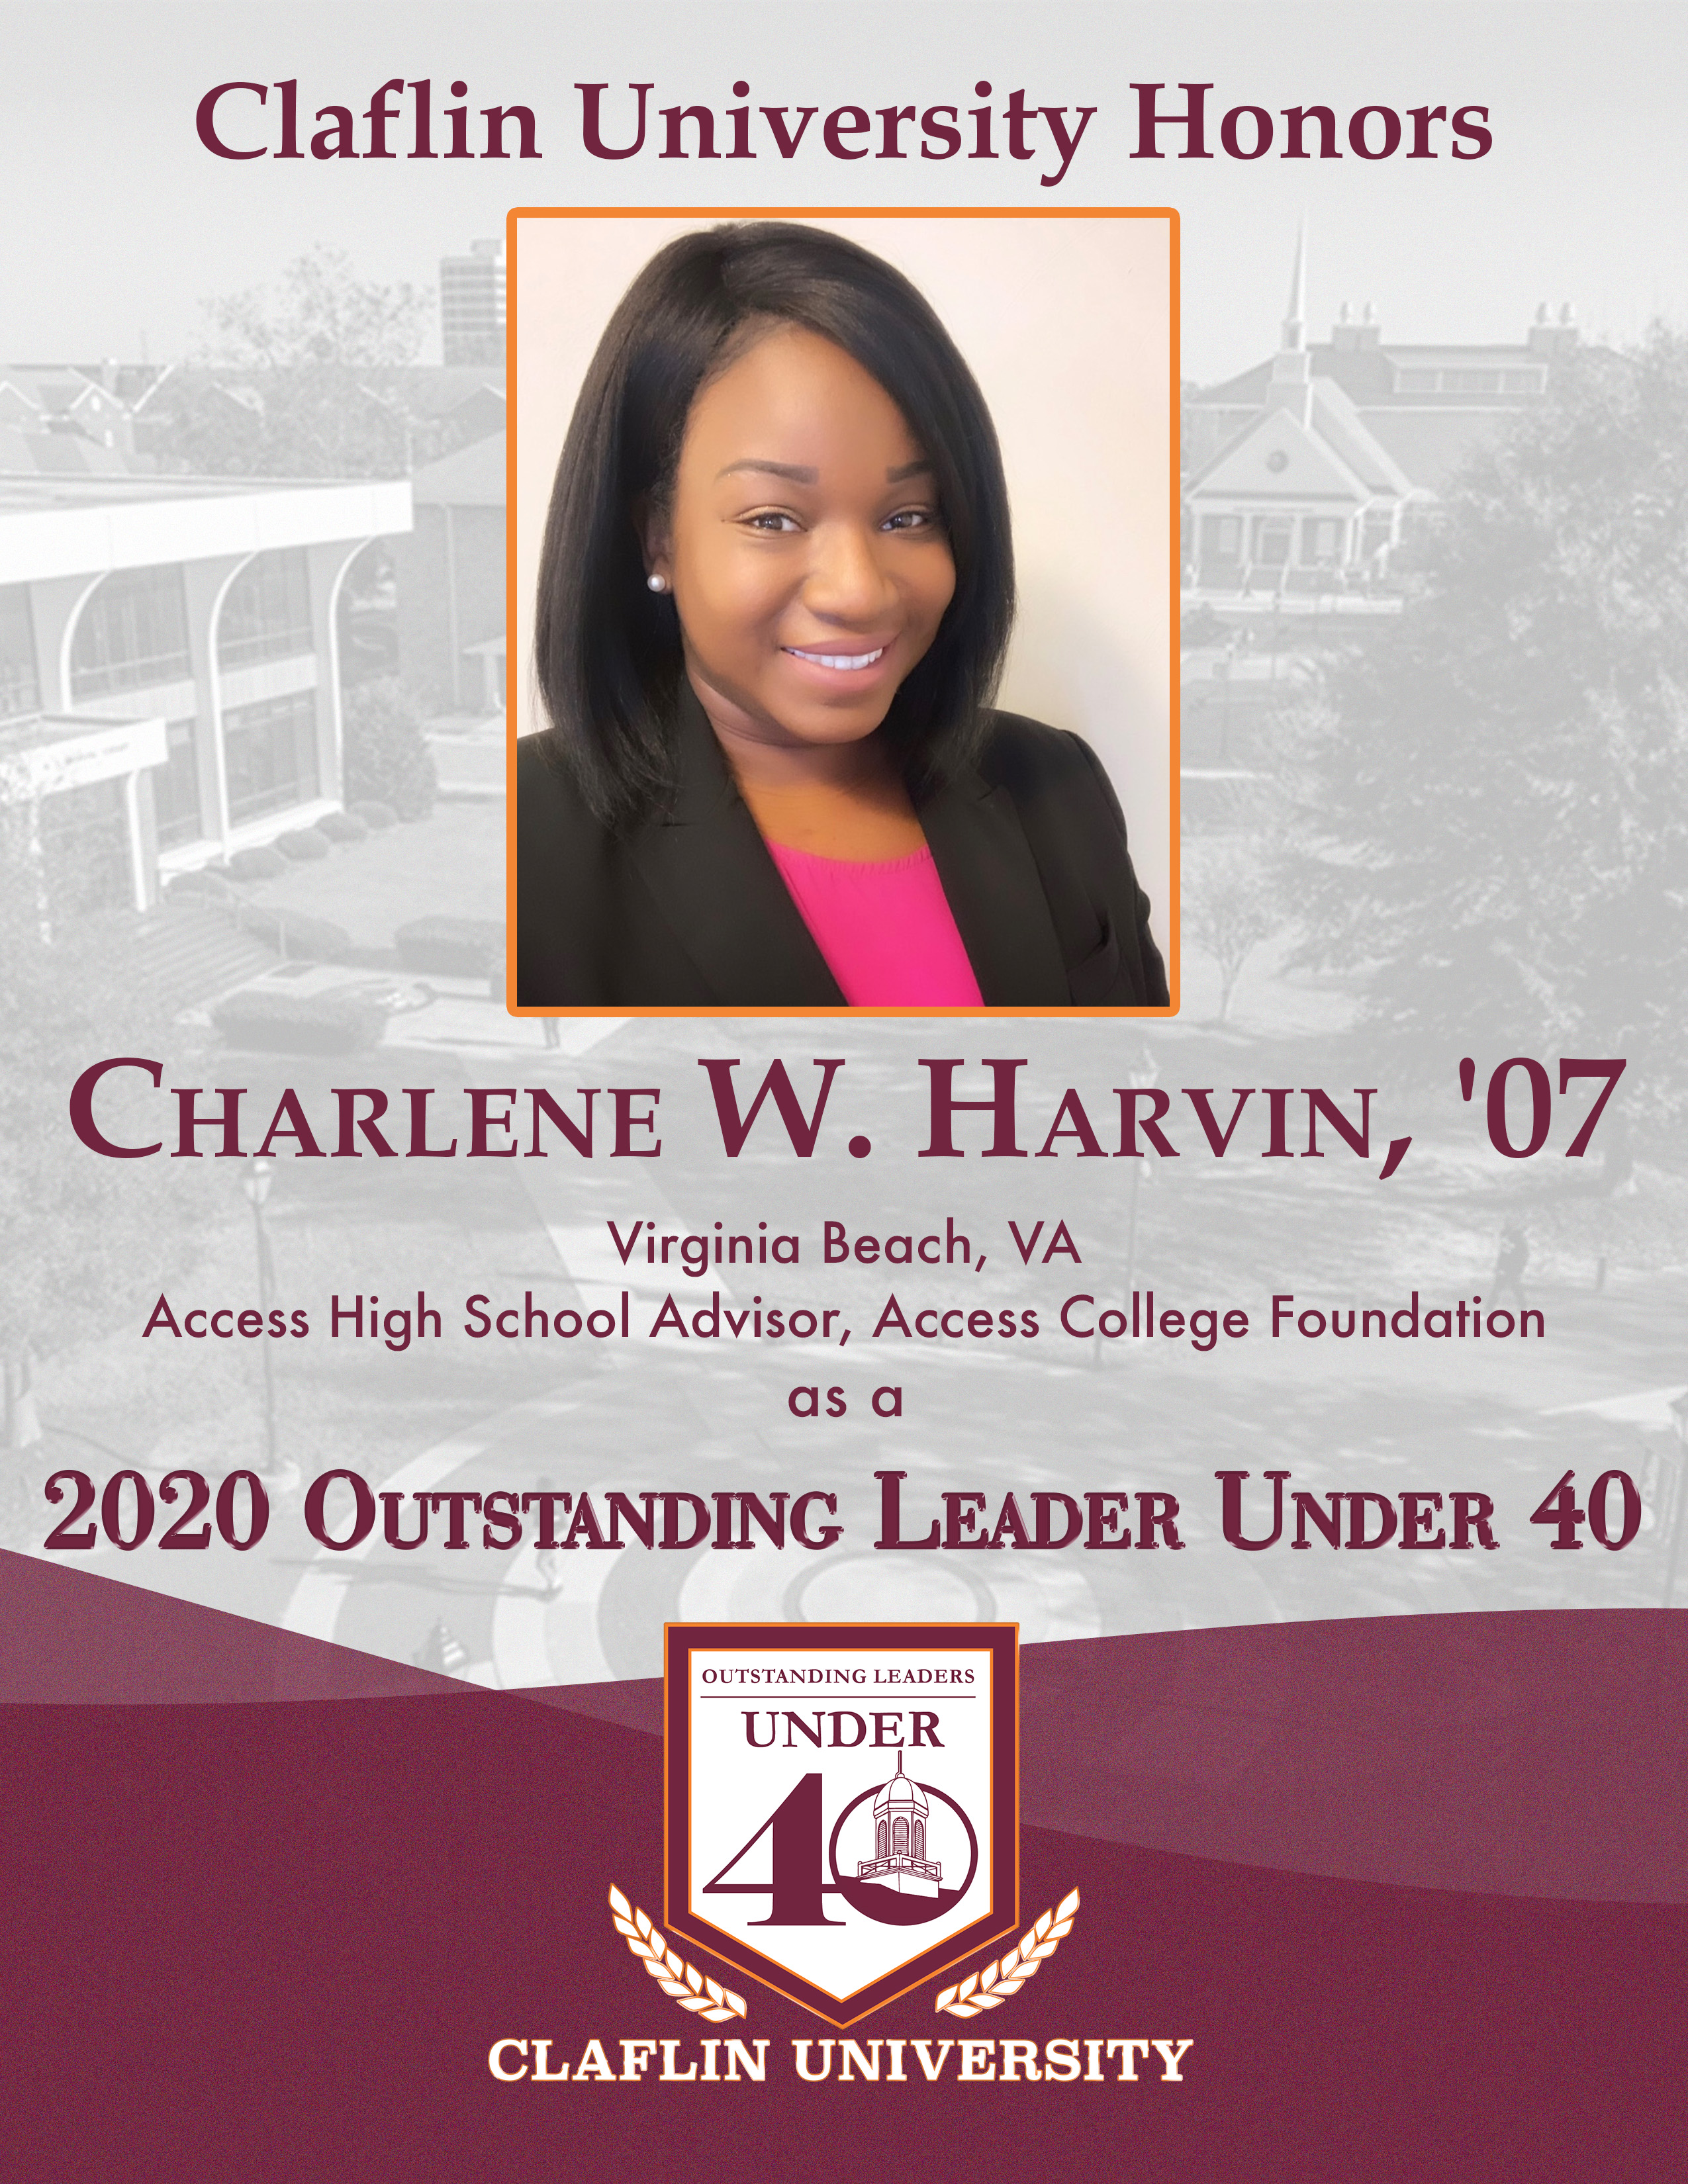 Charlene W. Harvin